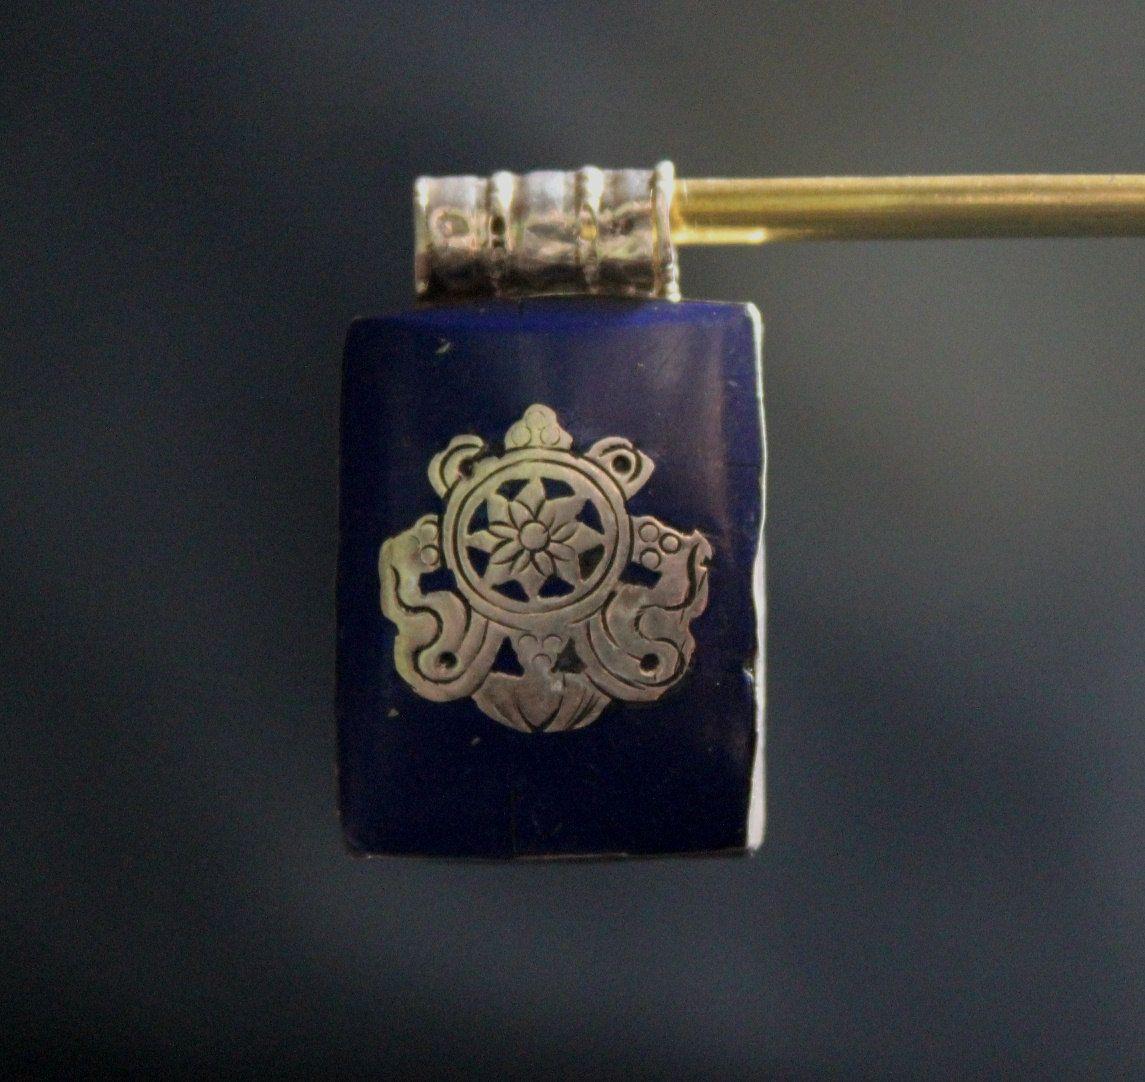 925 Sterling Silver Lapis Tibetan Ghau Pendant Handmade in Nepal by ShakyaHandicraft on Etsy